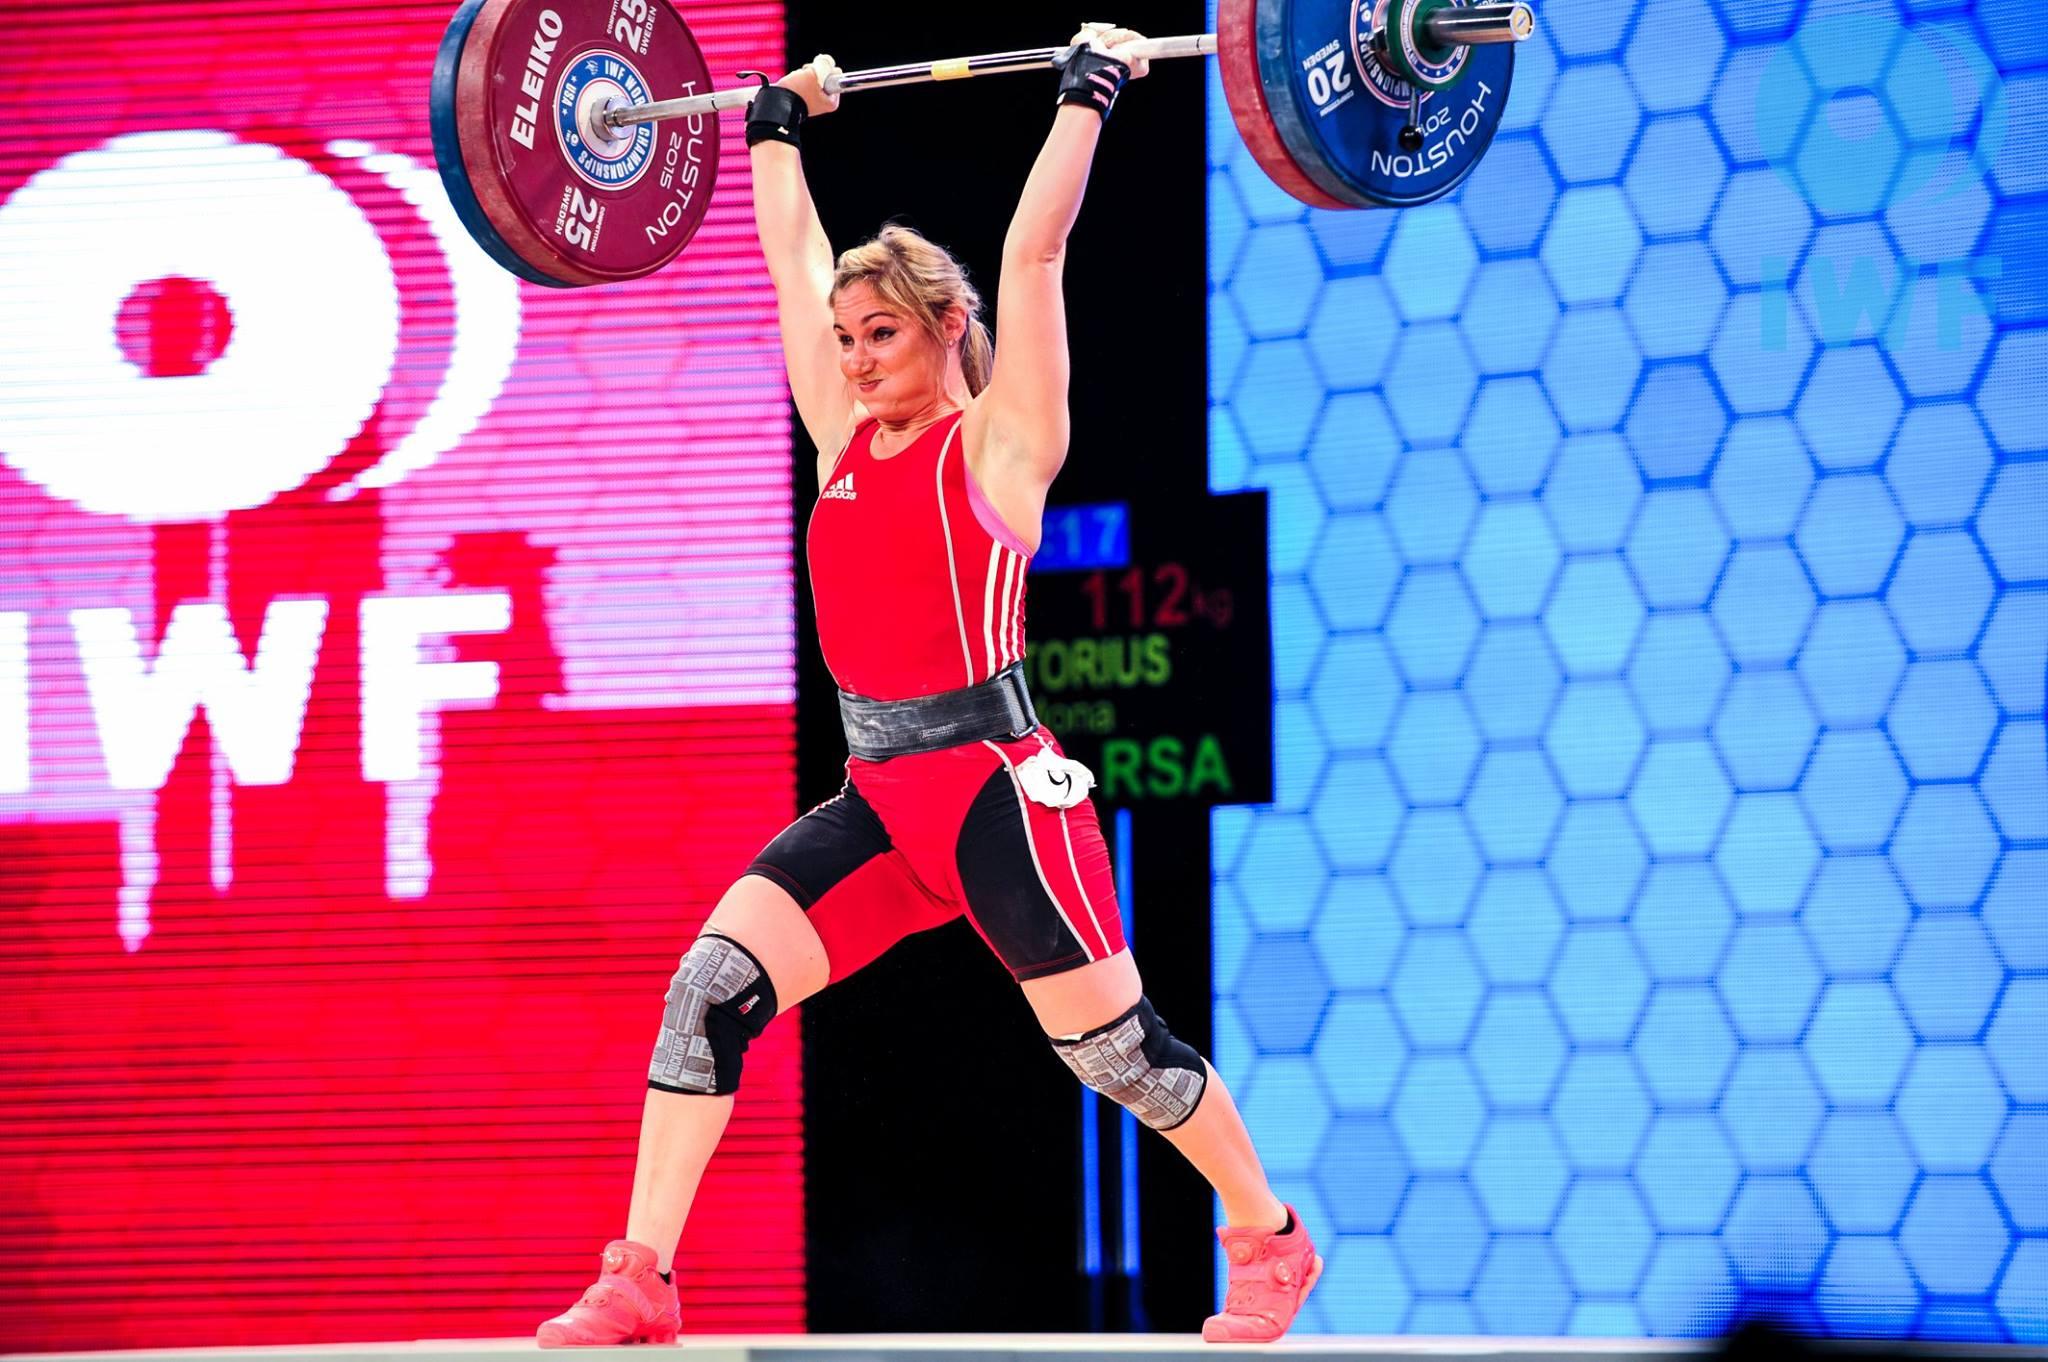 Pretorius pushes the limits at World Championships